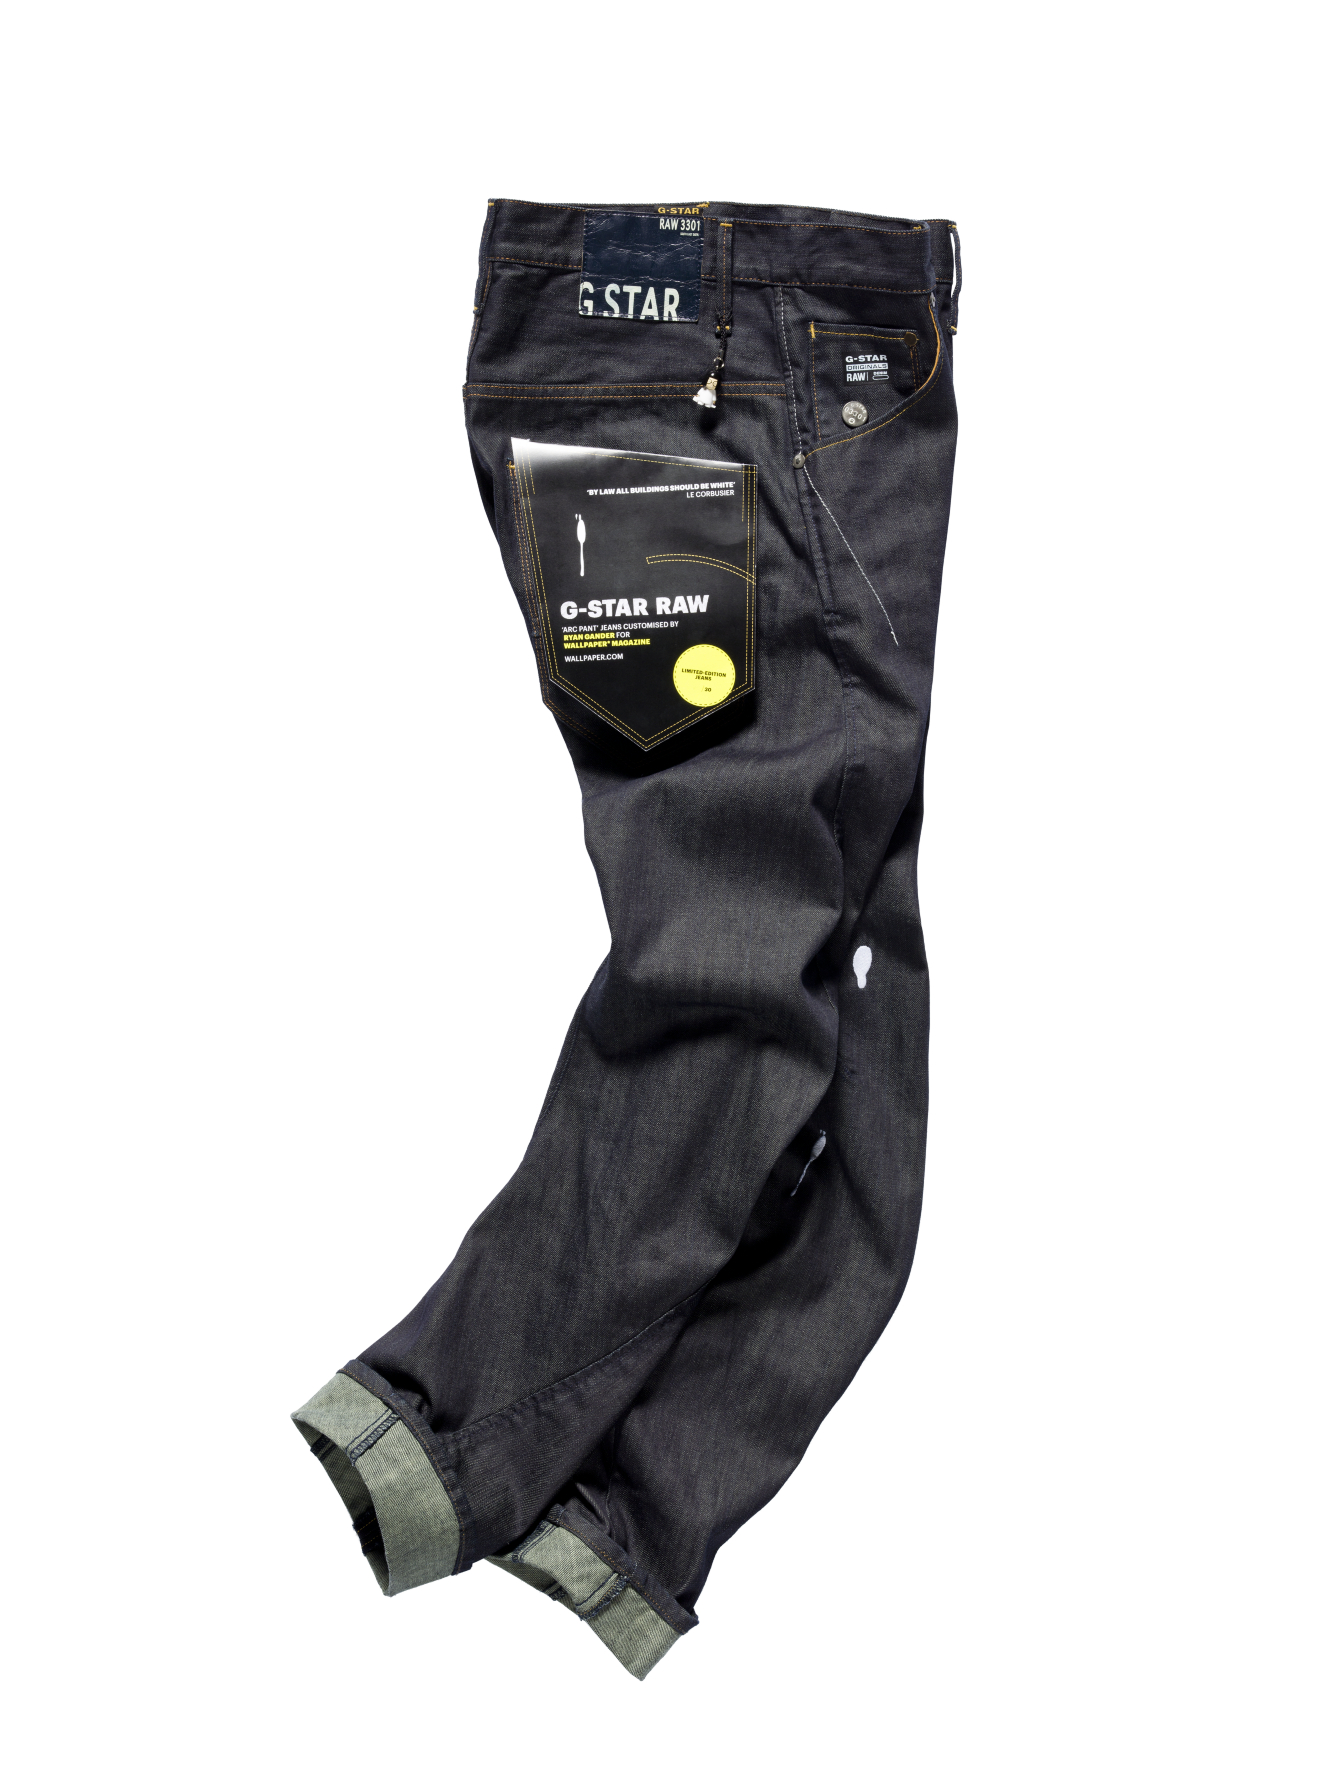 Loose Jeans For Men